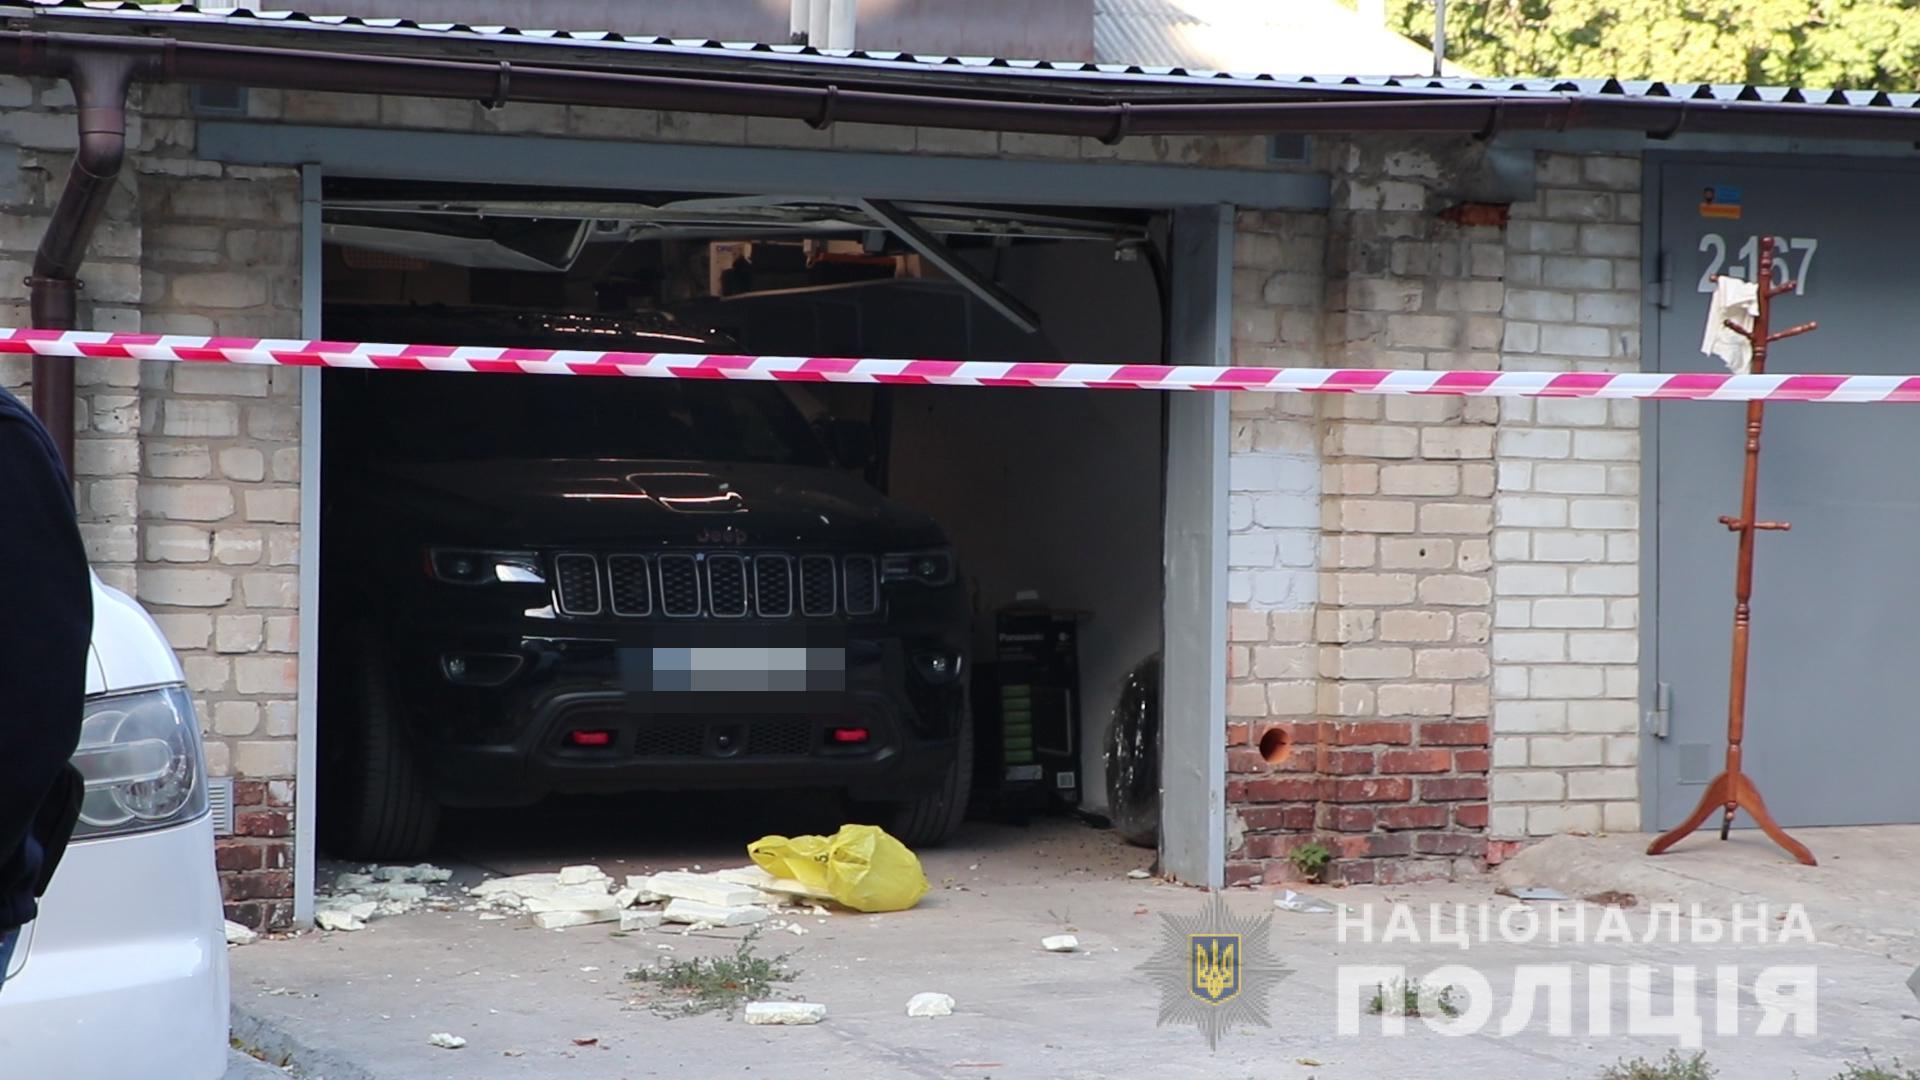 57-летний мужчина покончил собой в гараже на ул. Алчевских в Харькове (фото)